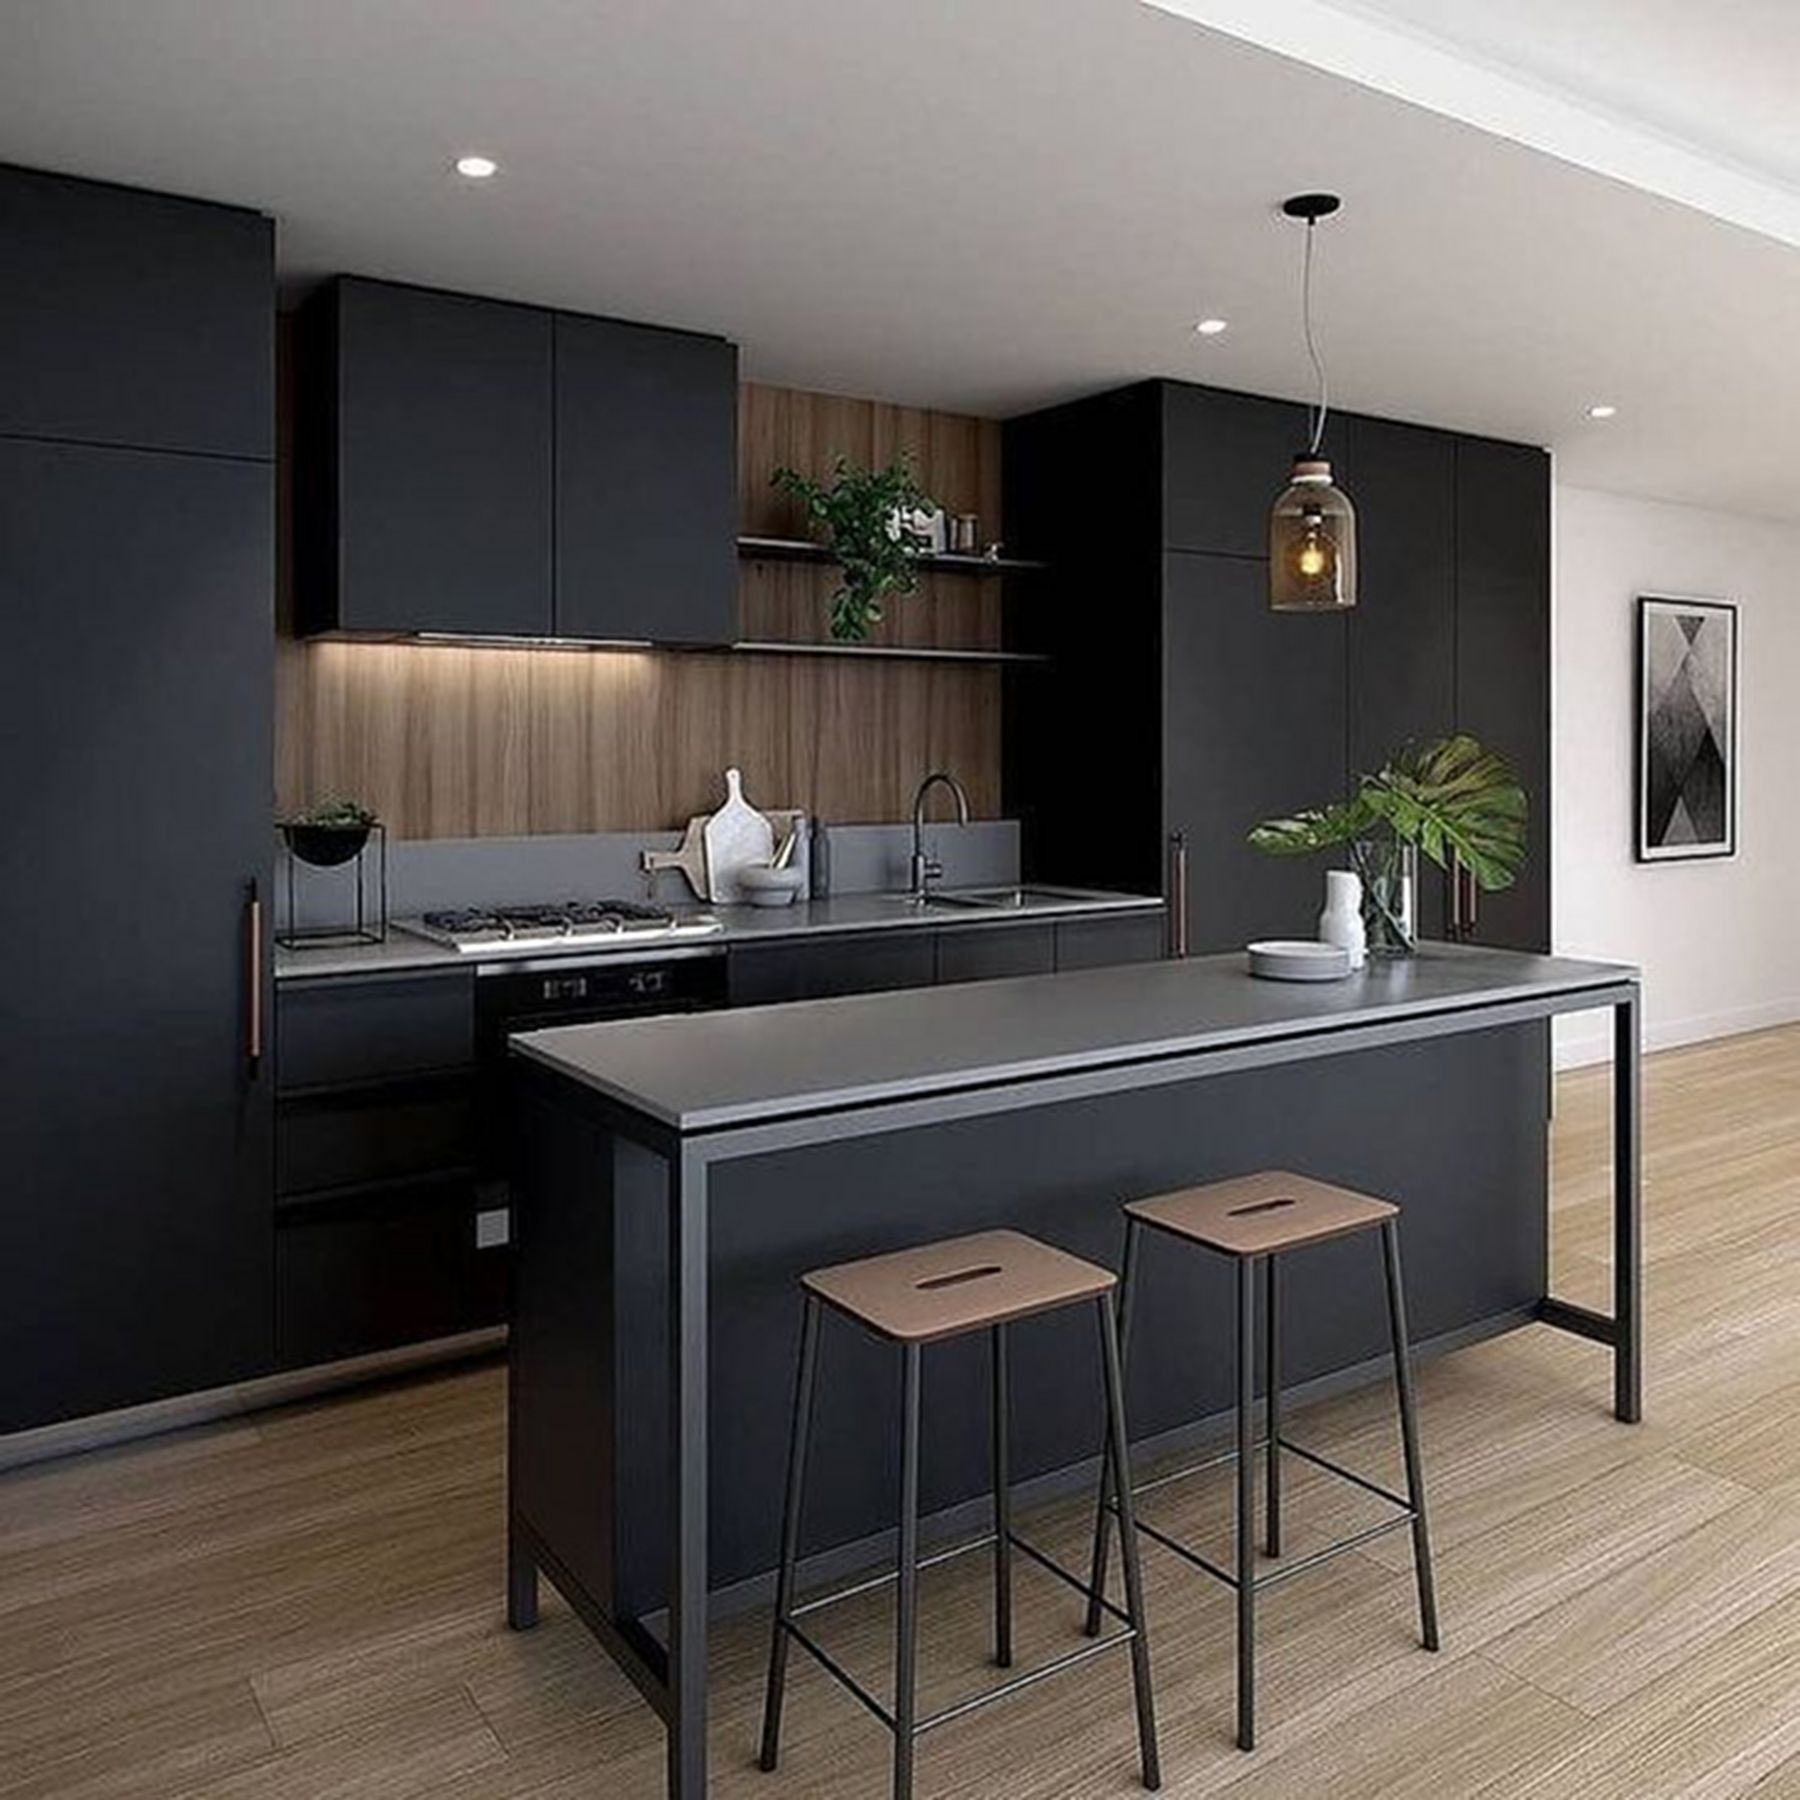 10 Elegant Black Kitchen Design Ideas To Make Your Kitchen Amazing Modern Kitchen Design Kitchen Design Modern Small Kitchen Decor Modern